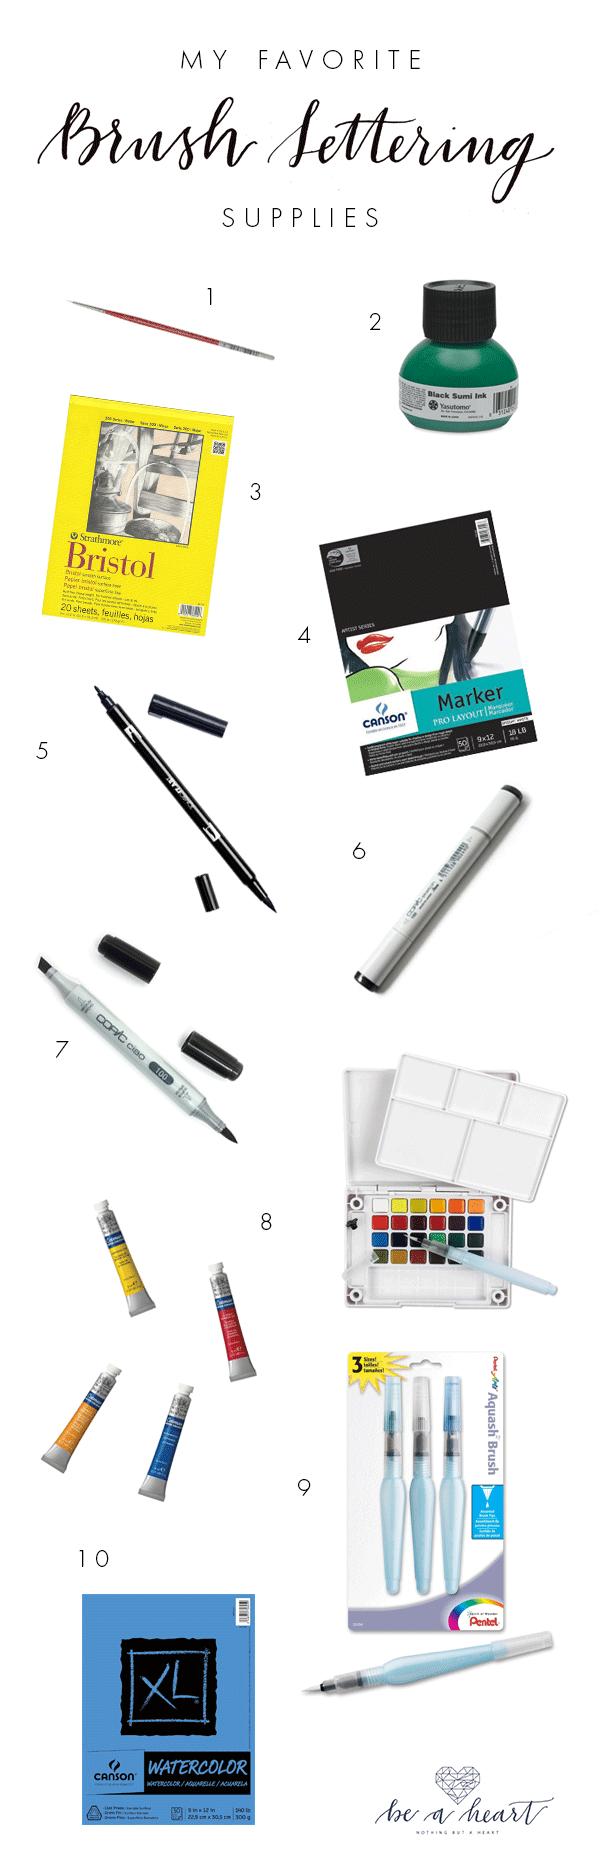 Favorite Brush Lettering Supplies